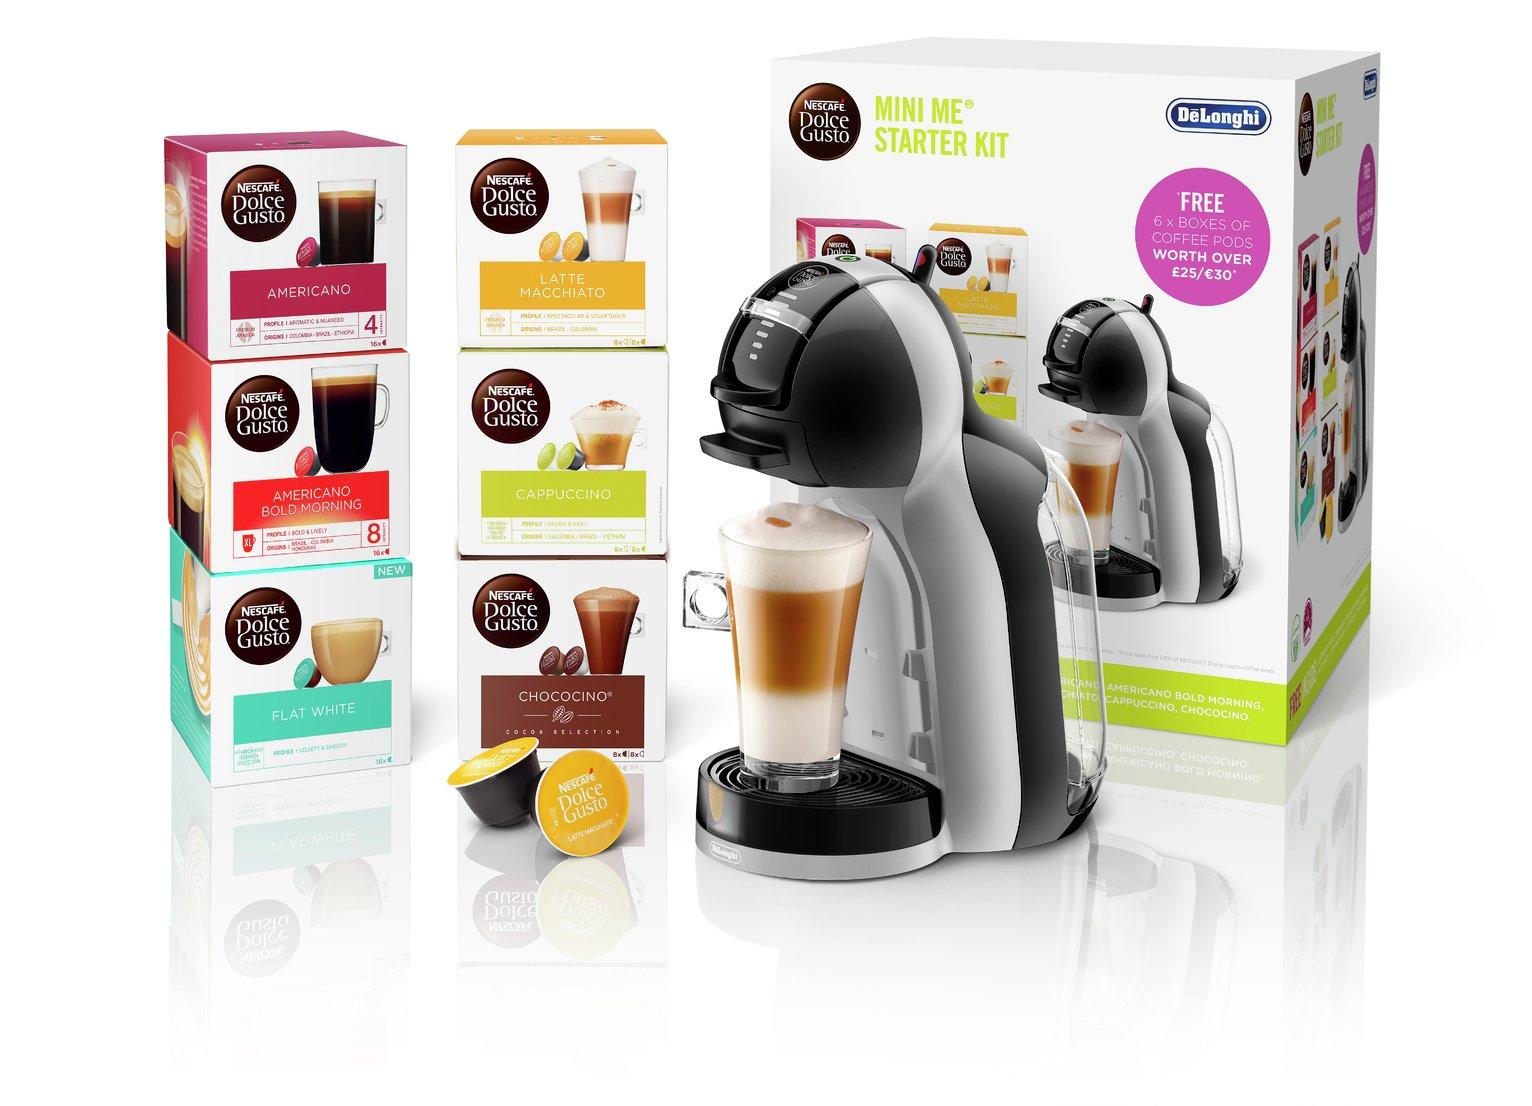 Nescafe Dolce Gusto De'Longhi Mini Me Coffee Machine Bundle